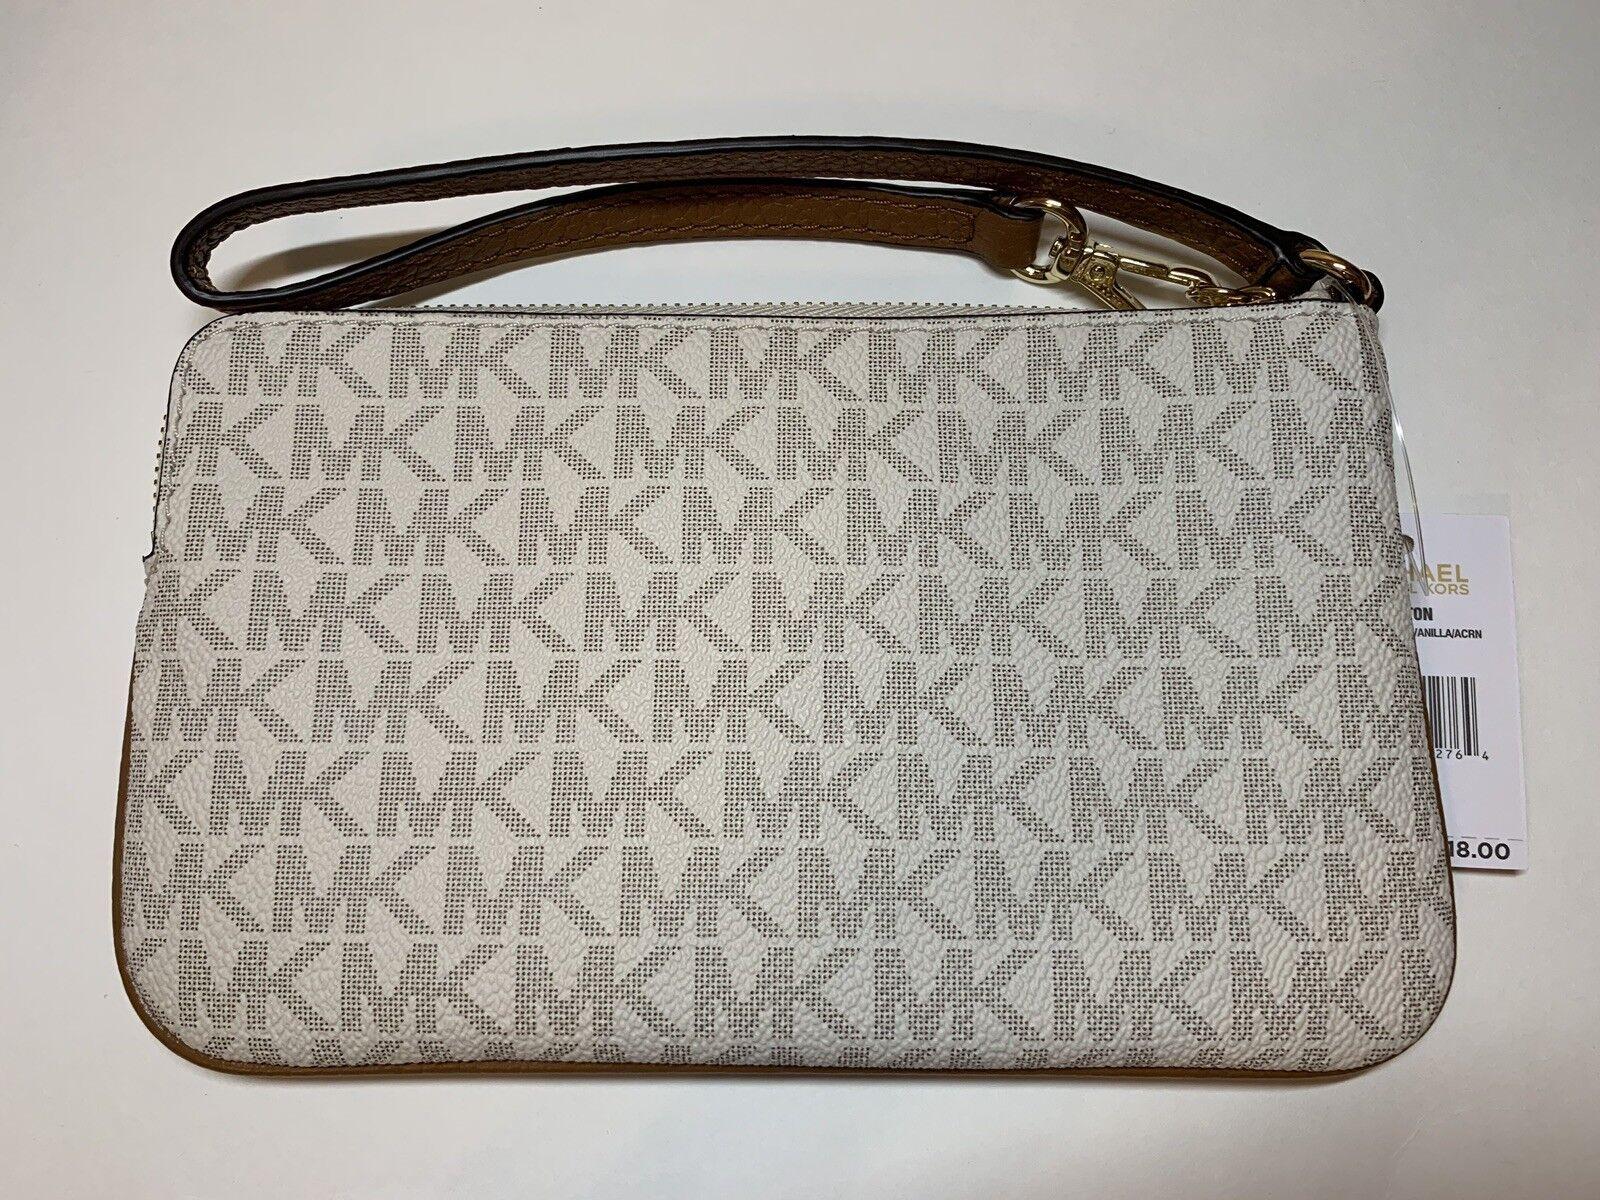 4ac307fba674 Michael Kors Fulton Large Top Zip PVC Leather Wristlet MK Signature Vanilla  for sale online | eBay